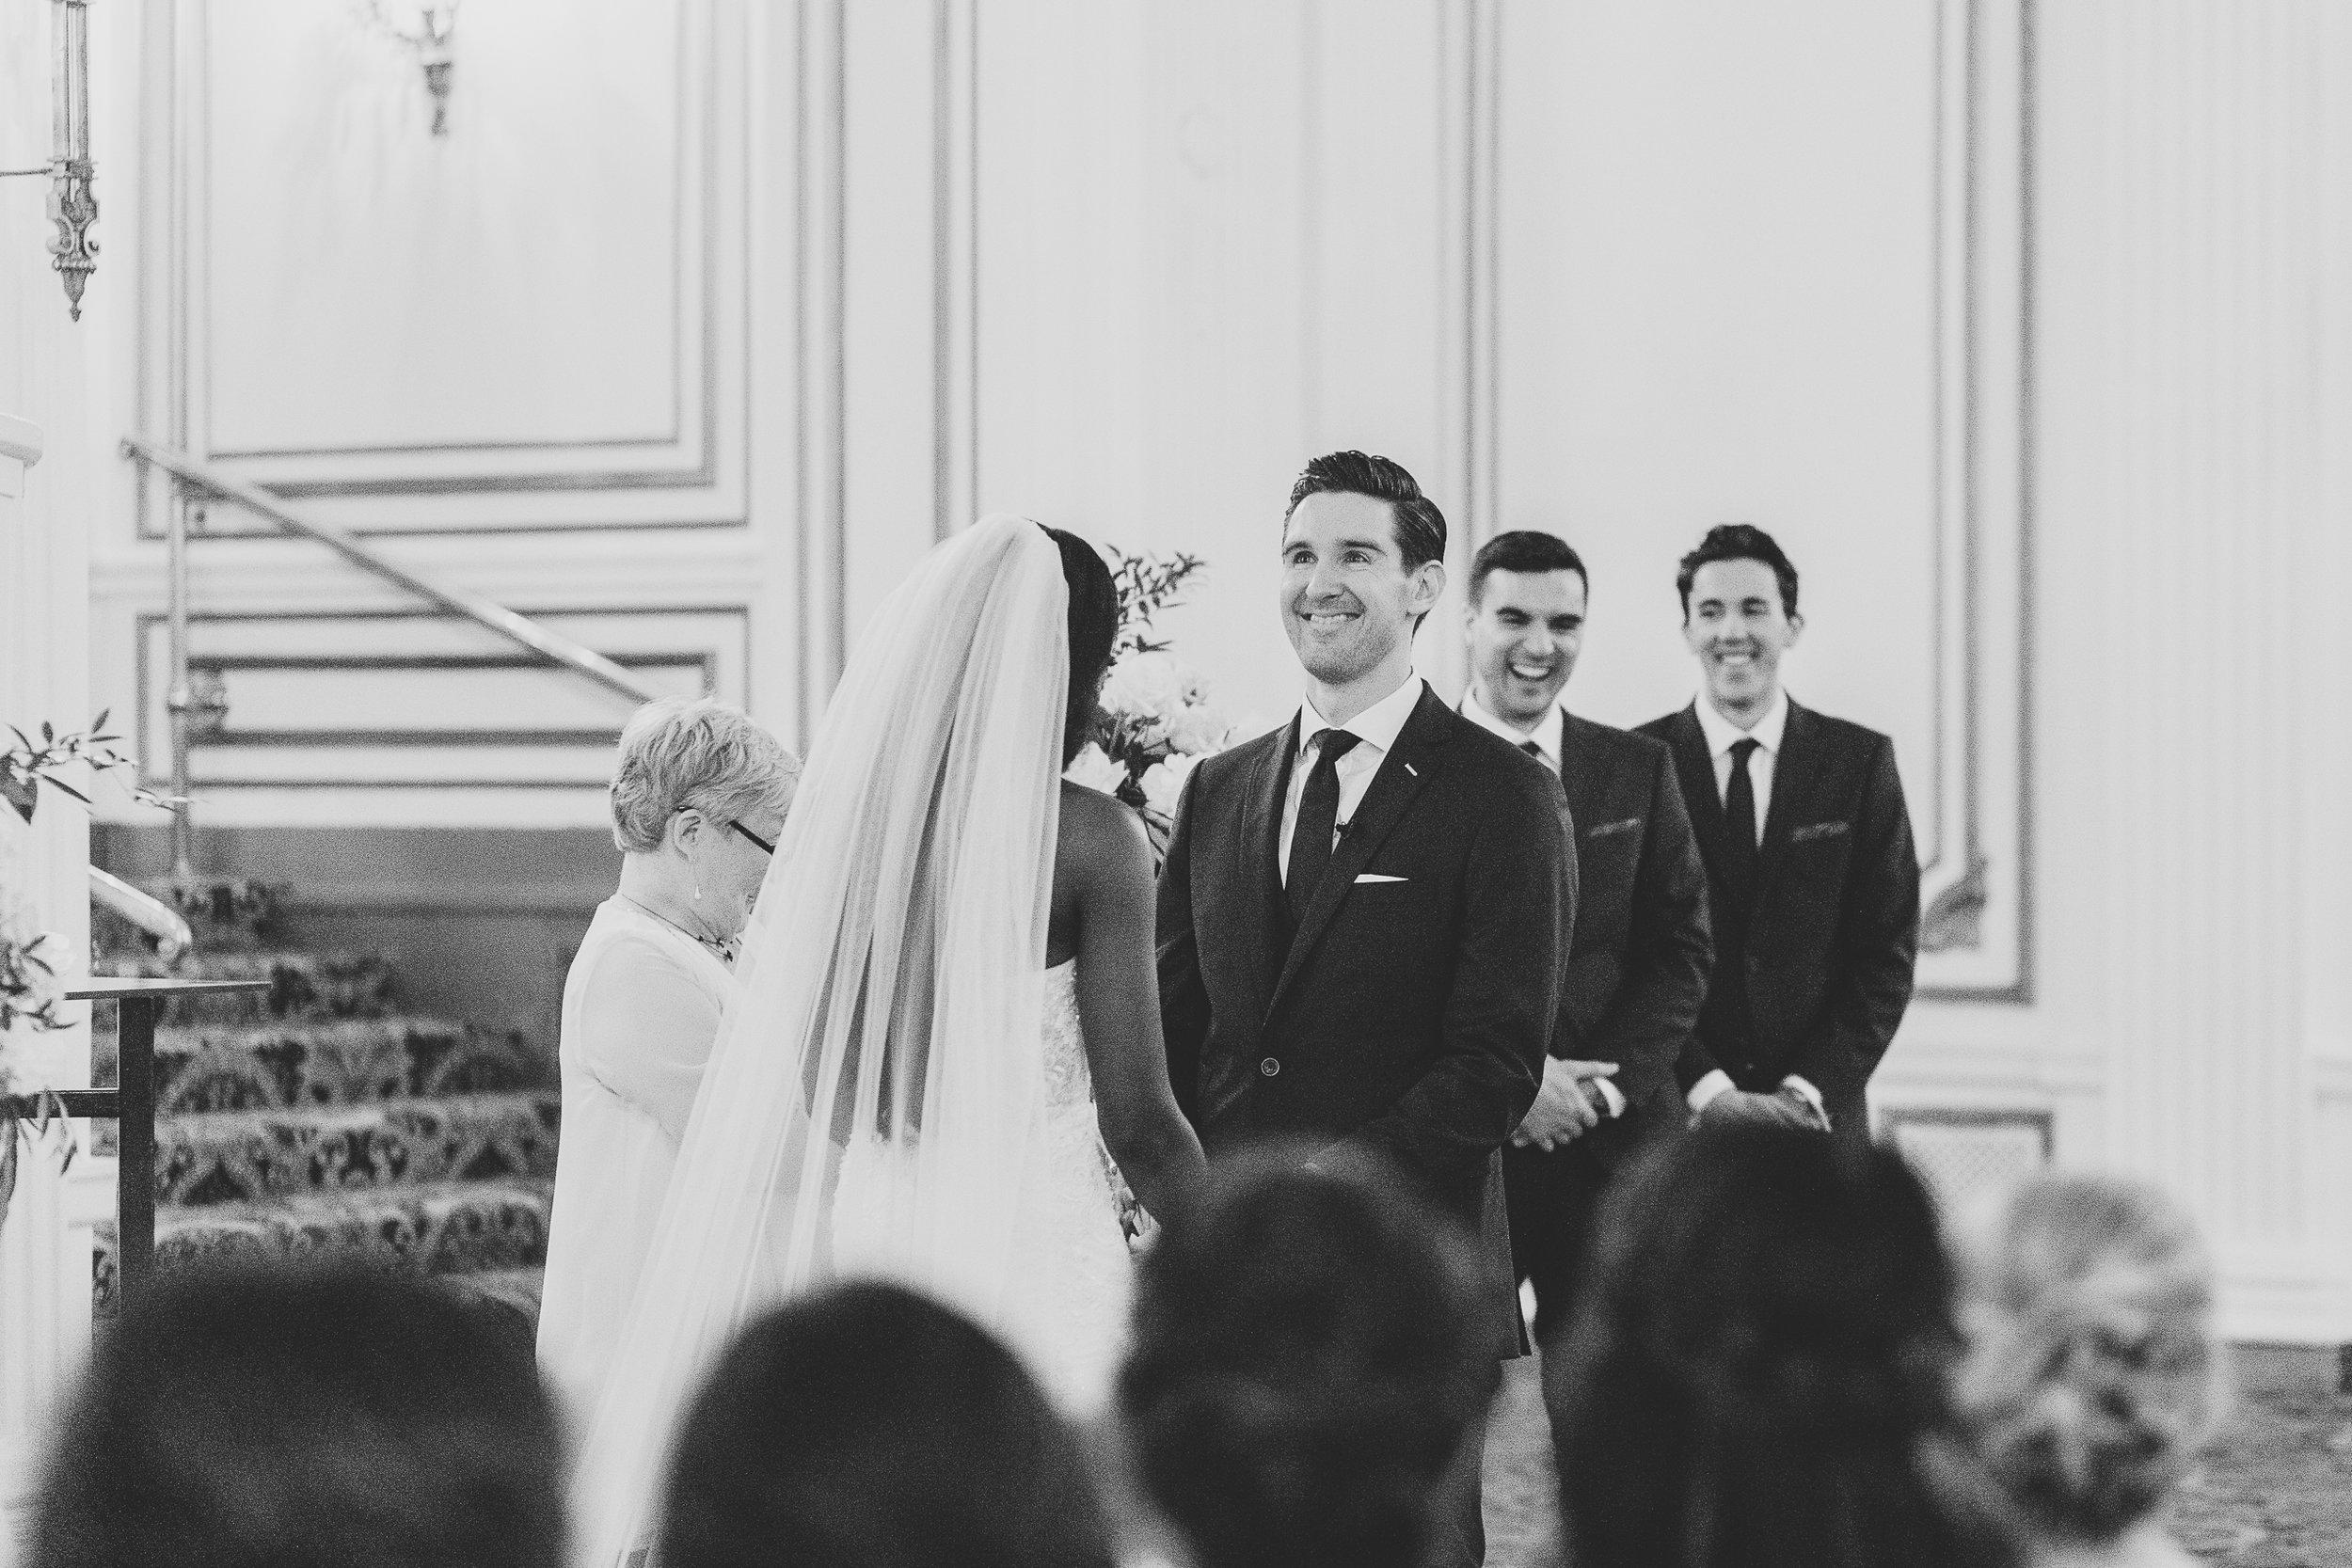 fairmont-copley-plaza-wedding-photos-00740.JPG